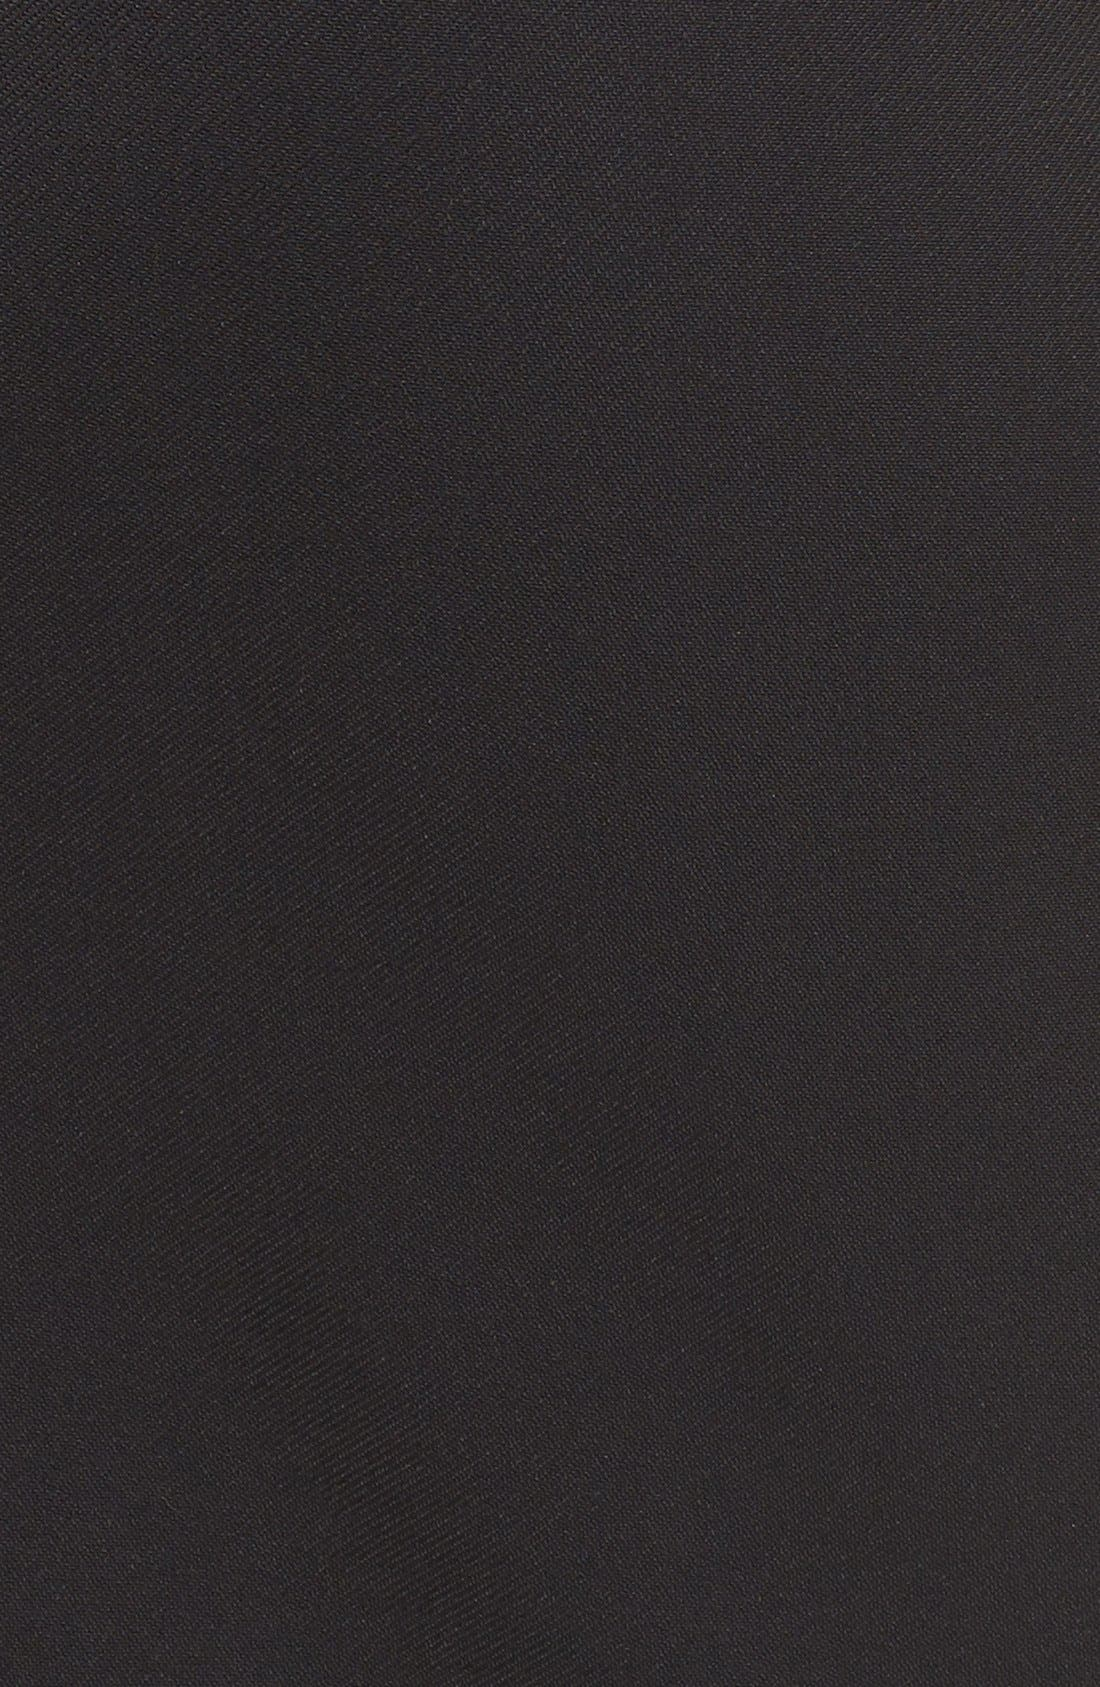 Asymmetrical Zip Pencil Skirt,                             Alternate thumbnail 6, color,                             Black